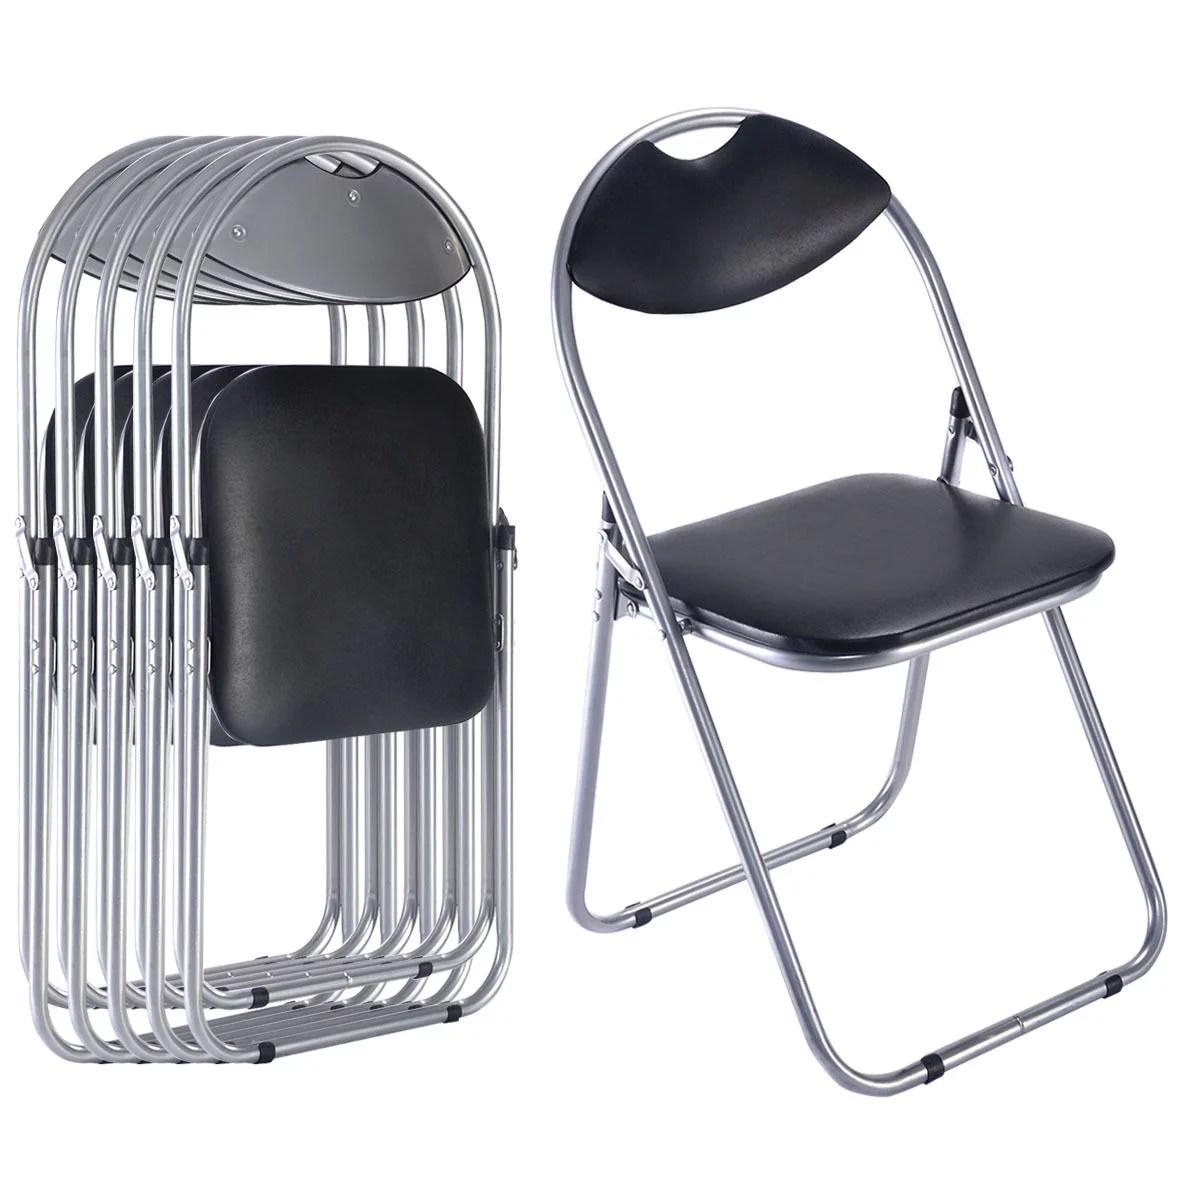 Costway 6 PCS U Shape Folding Chairs Furniture Home Outdoor Picnic Portable Black